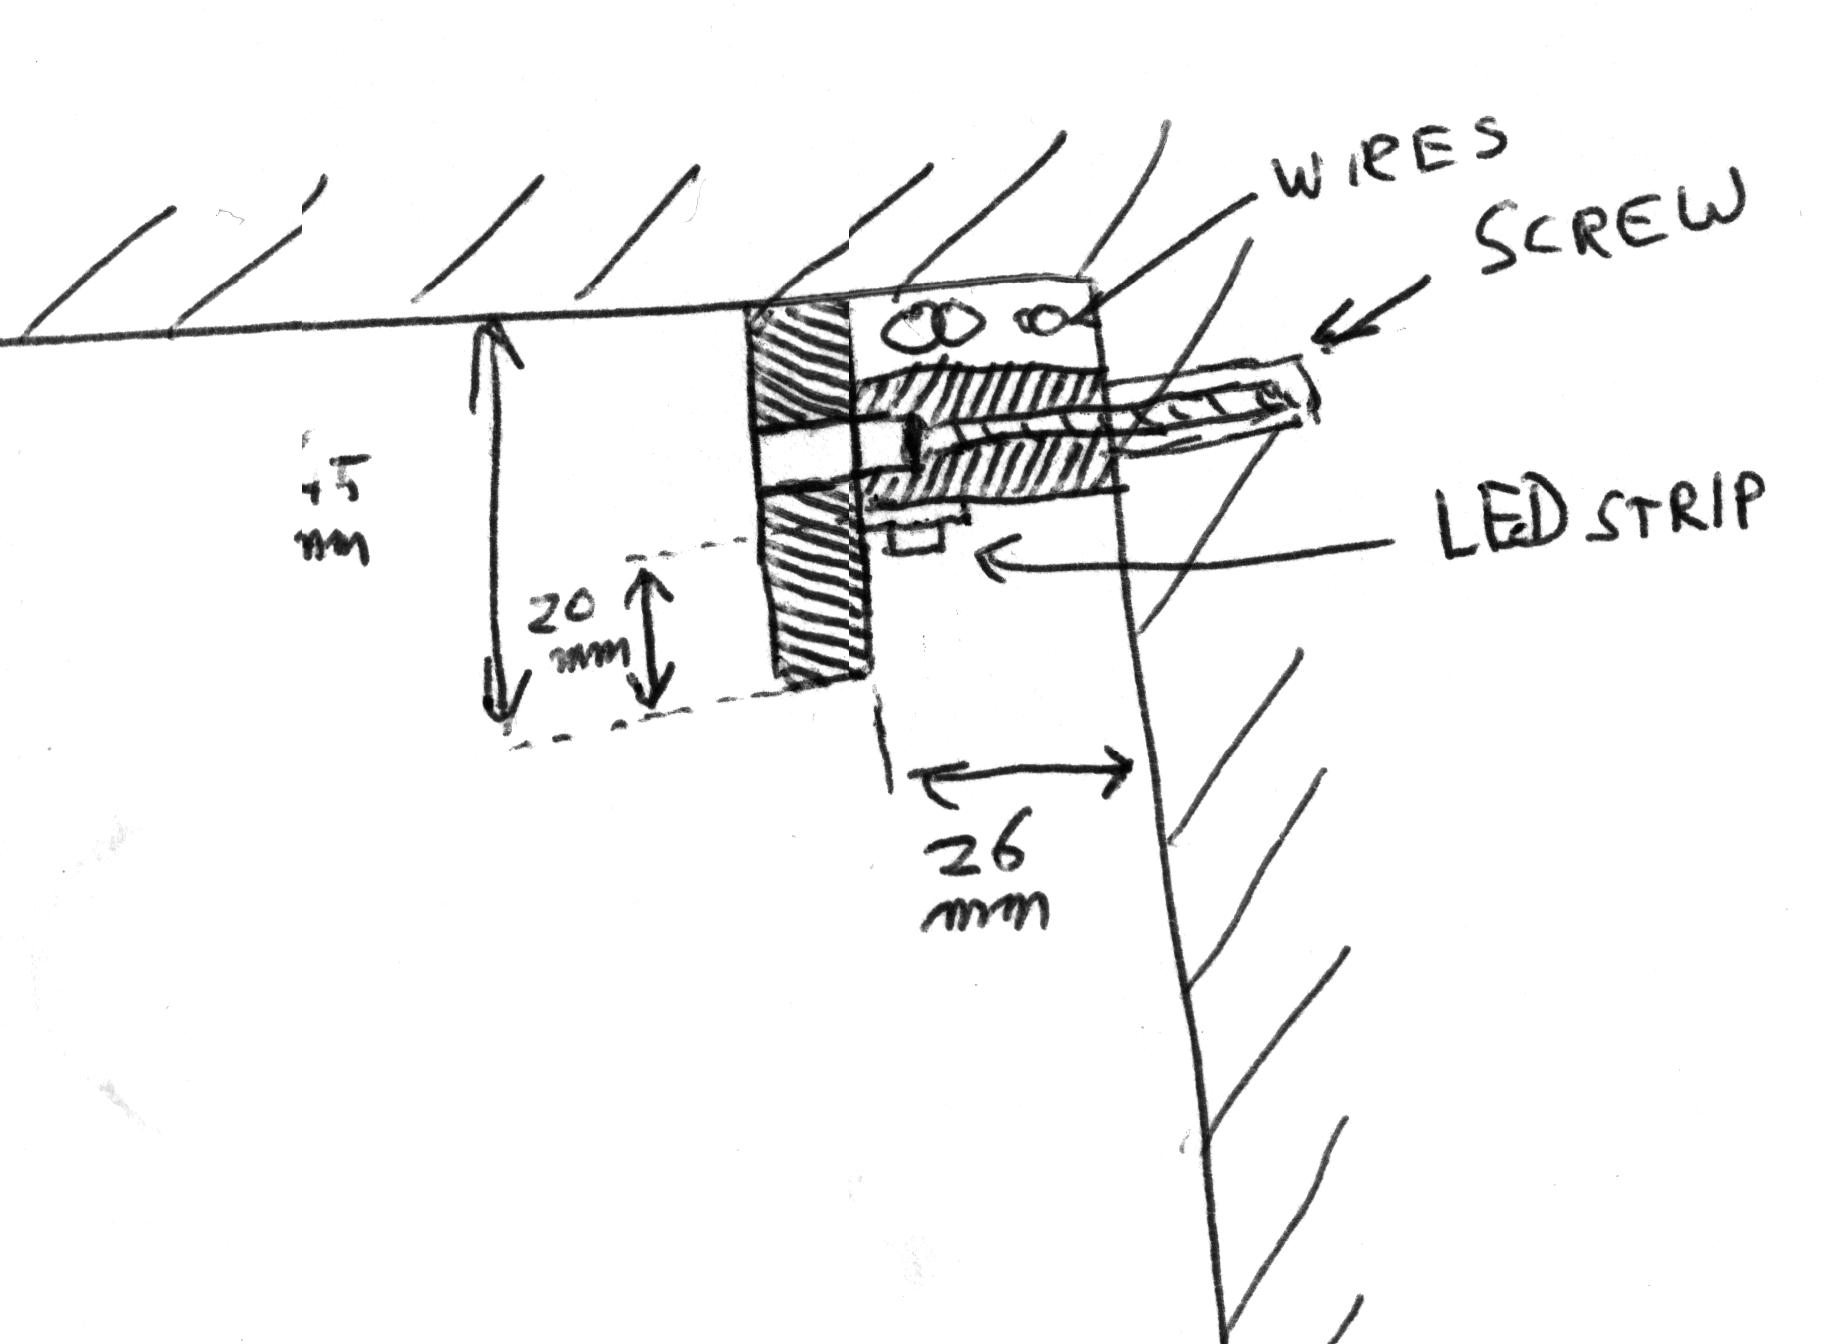 sprites mods - wall-lighting with rgb-leds